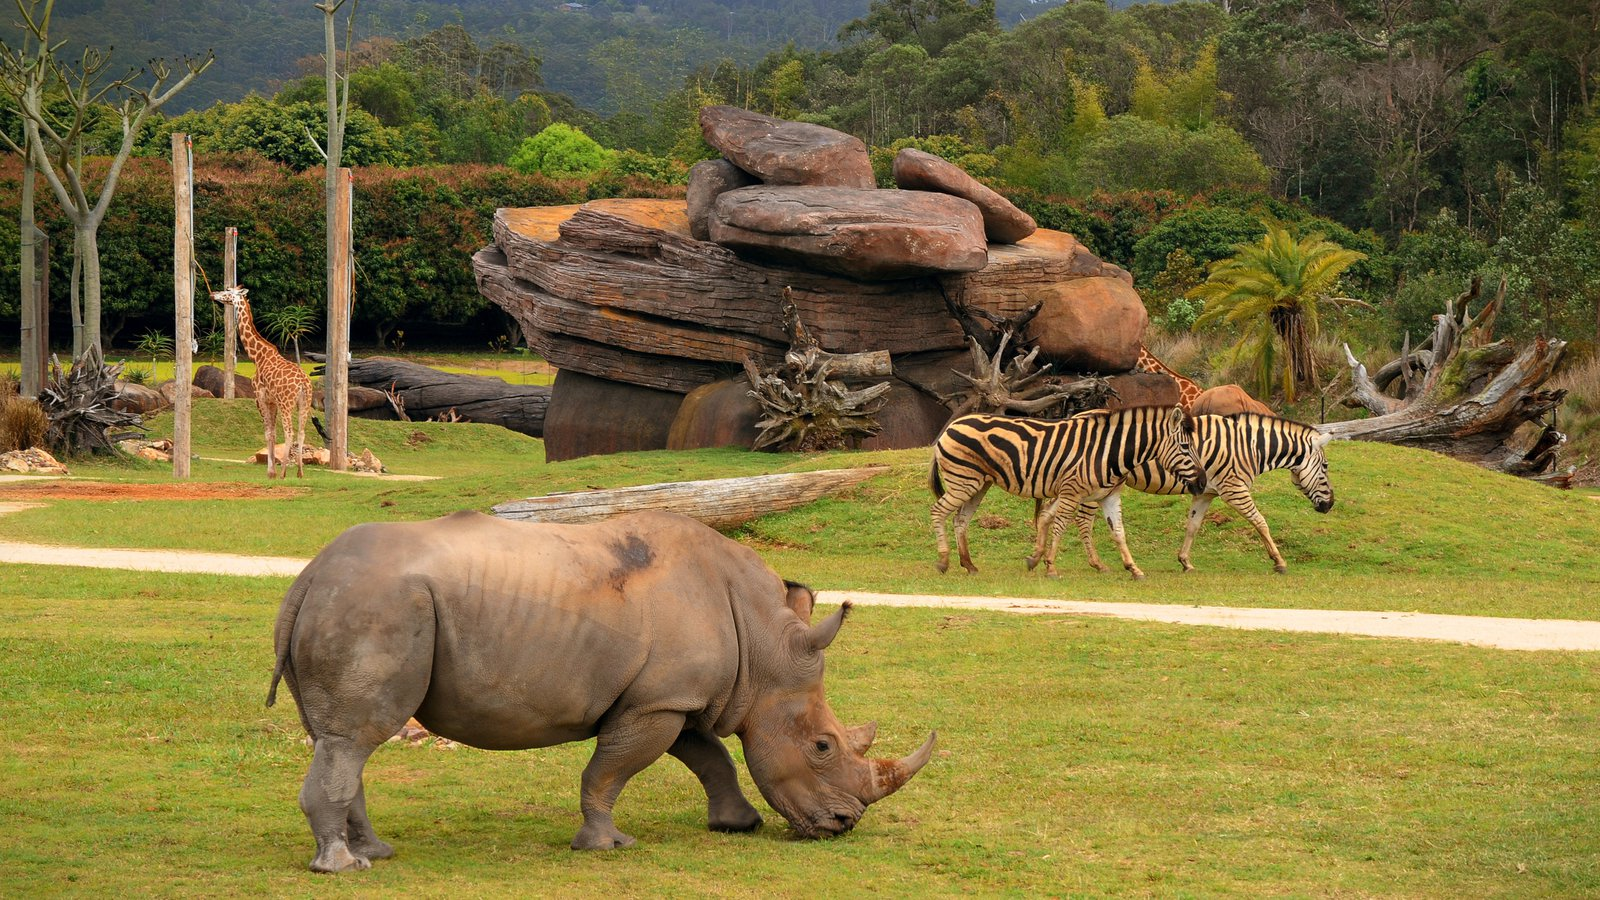 Australia Zoo showing land animals and zoo animals